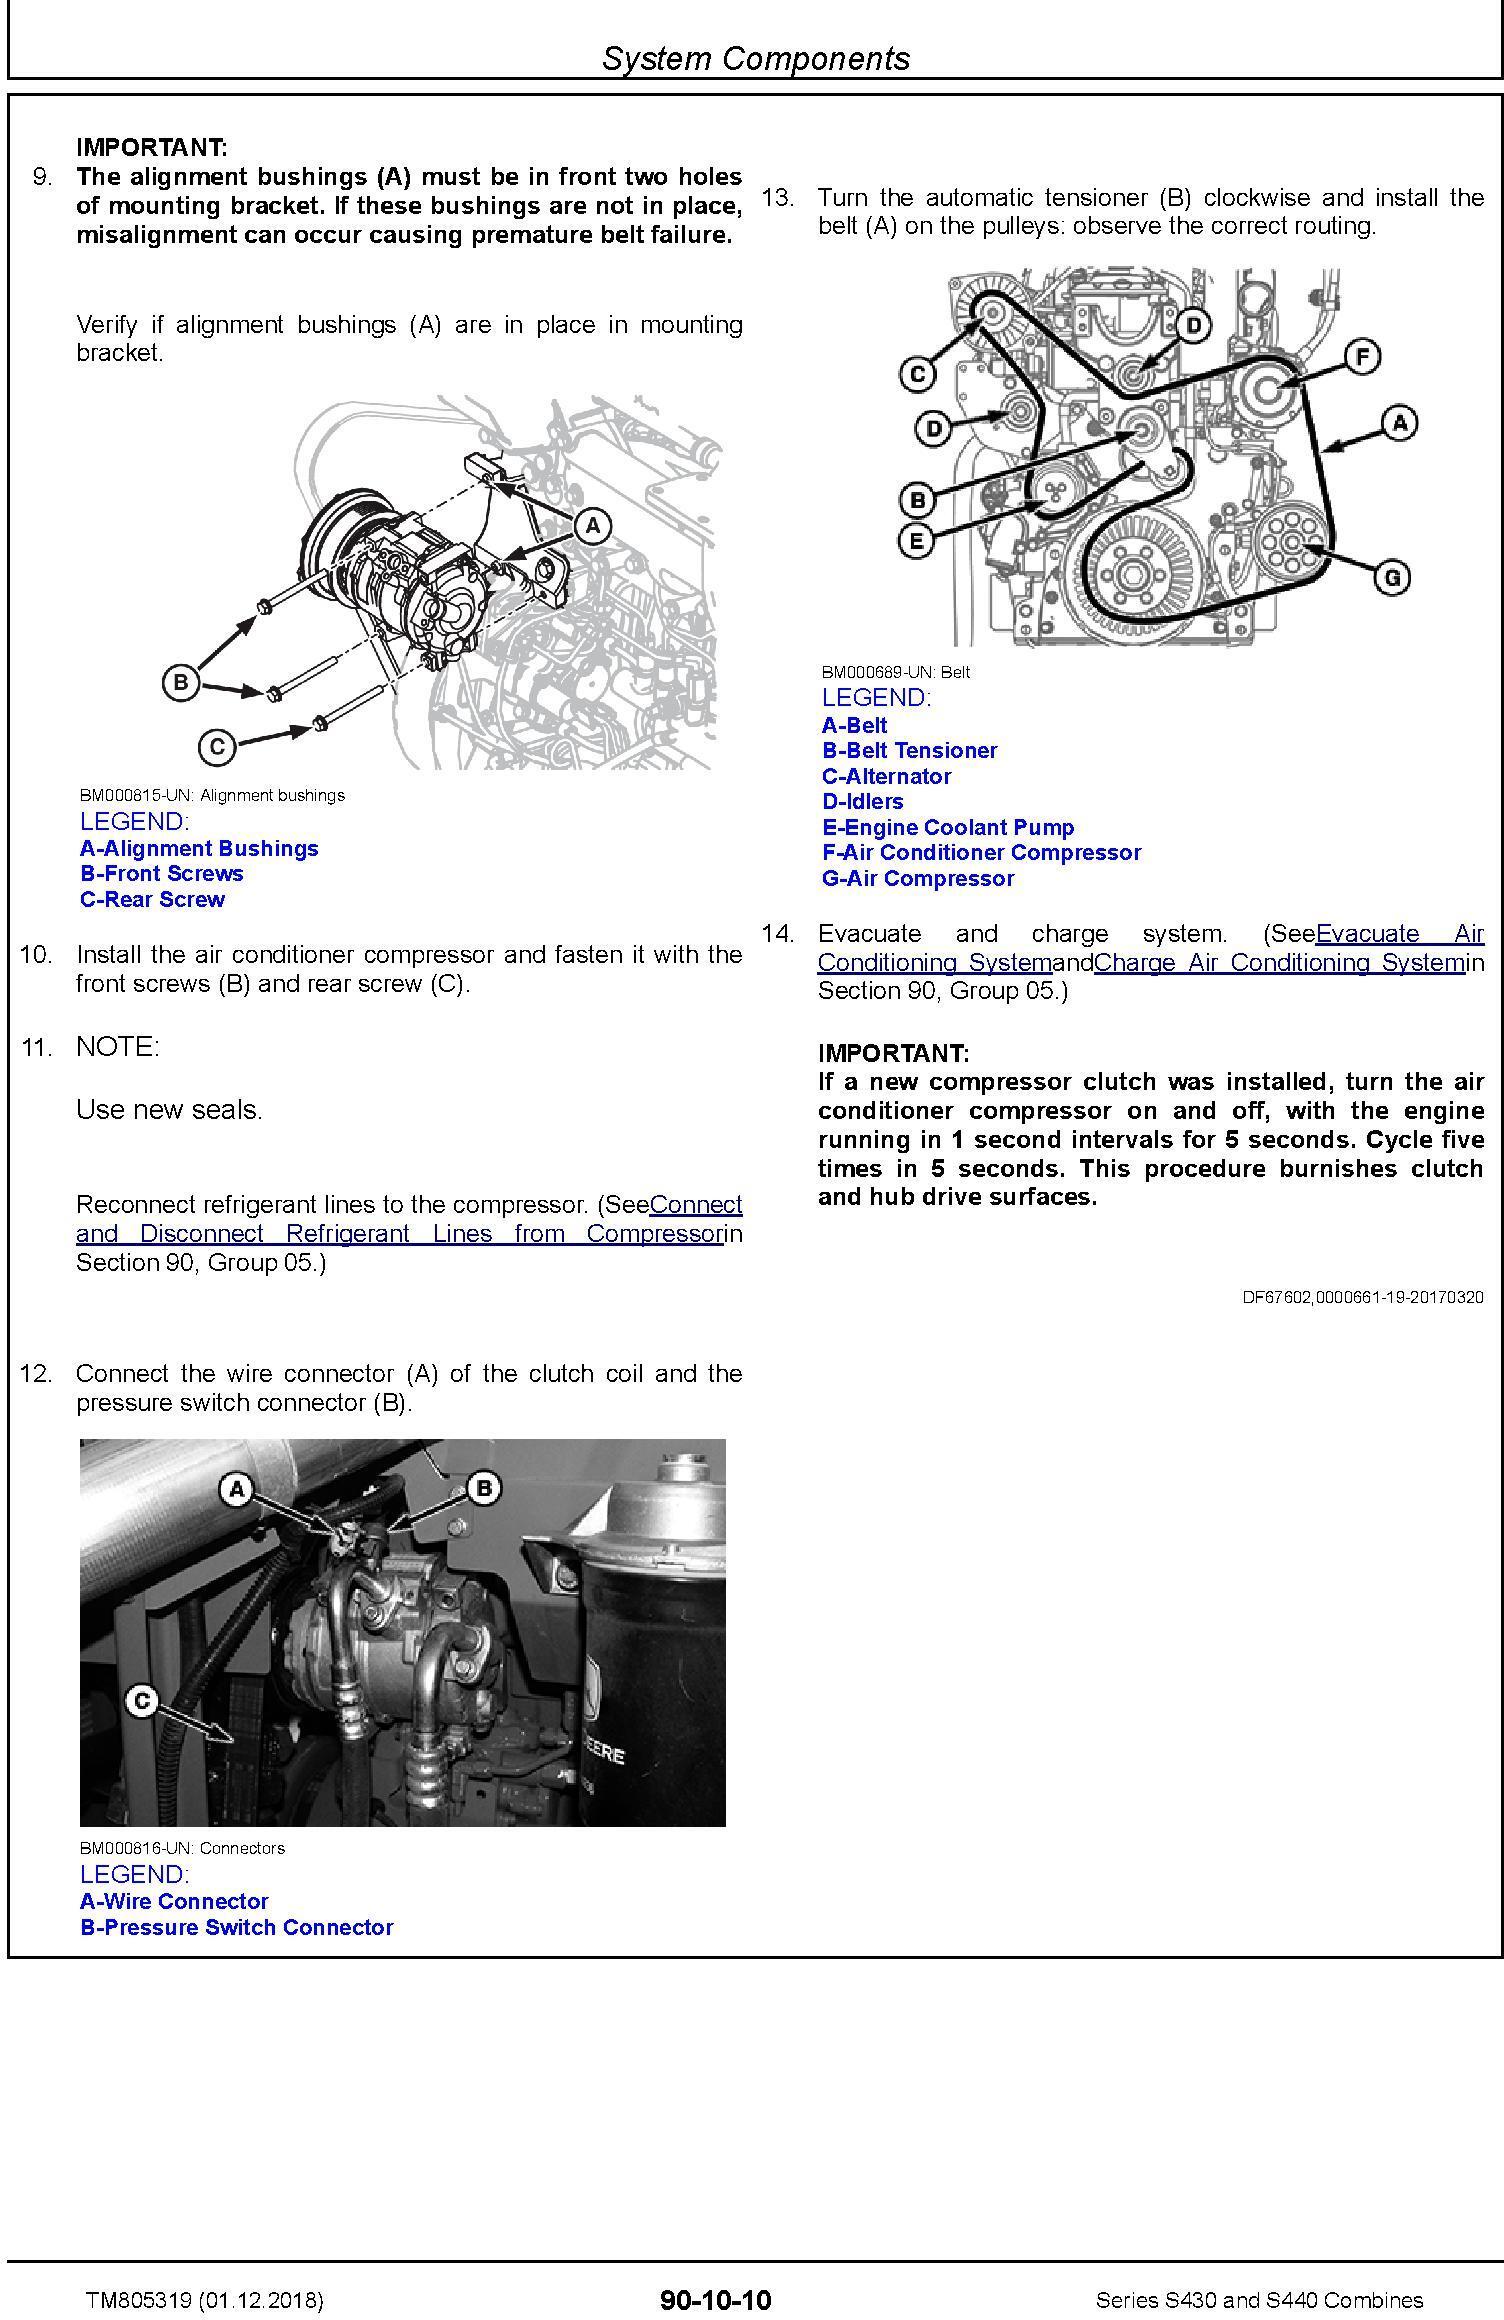 JD John Deere S430 and S440 Combines Repair Technical Service Manual (TM805319) - 3